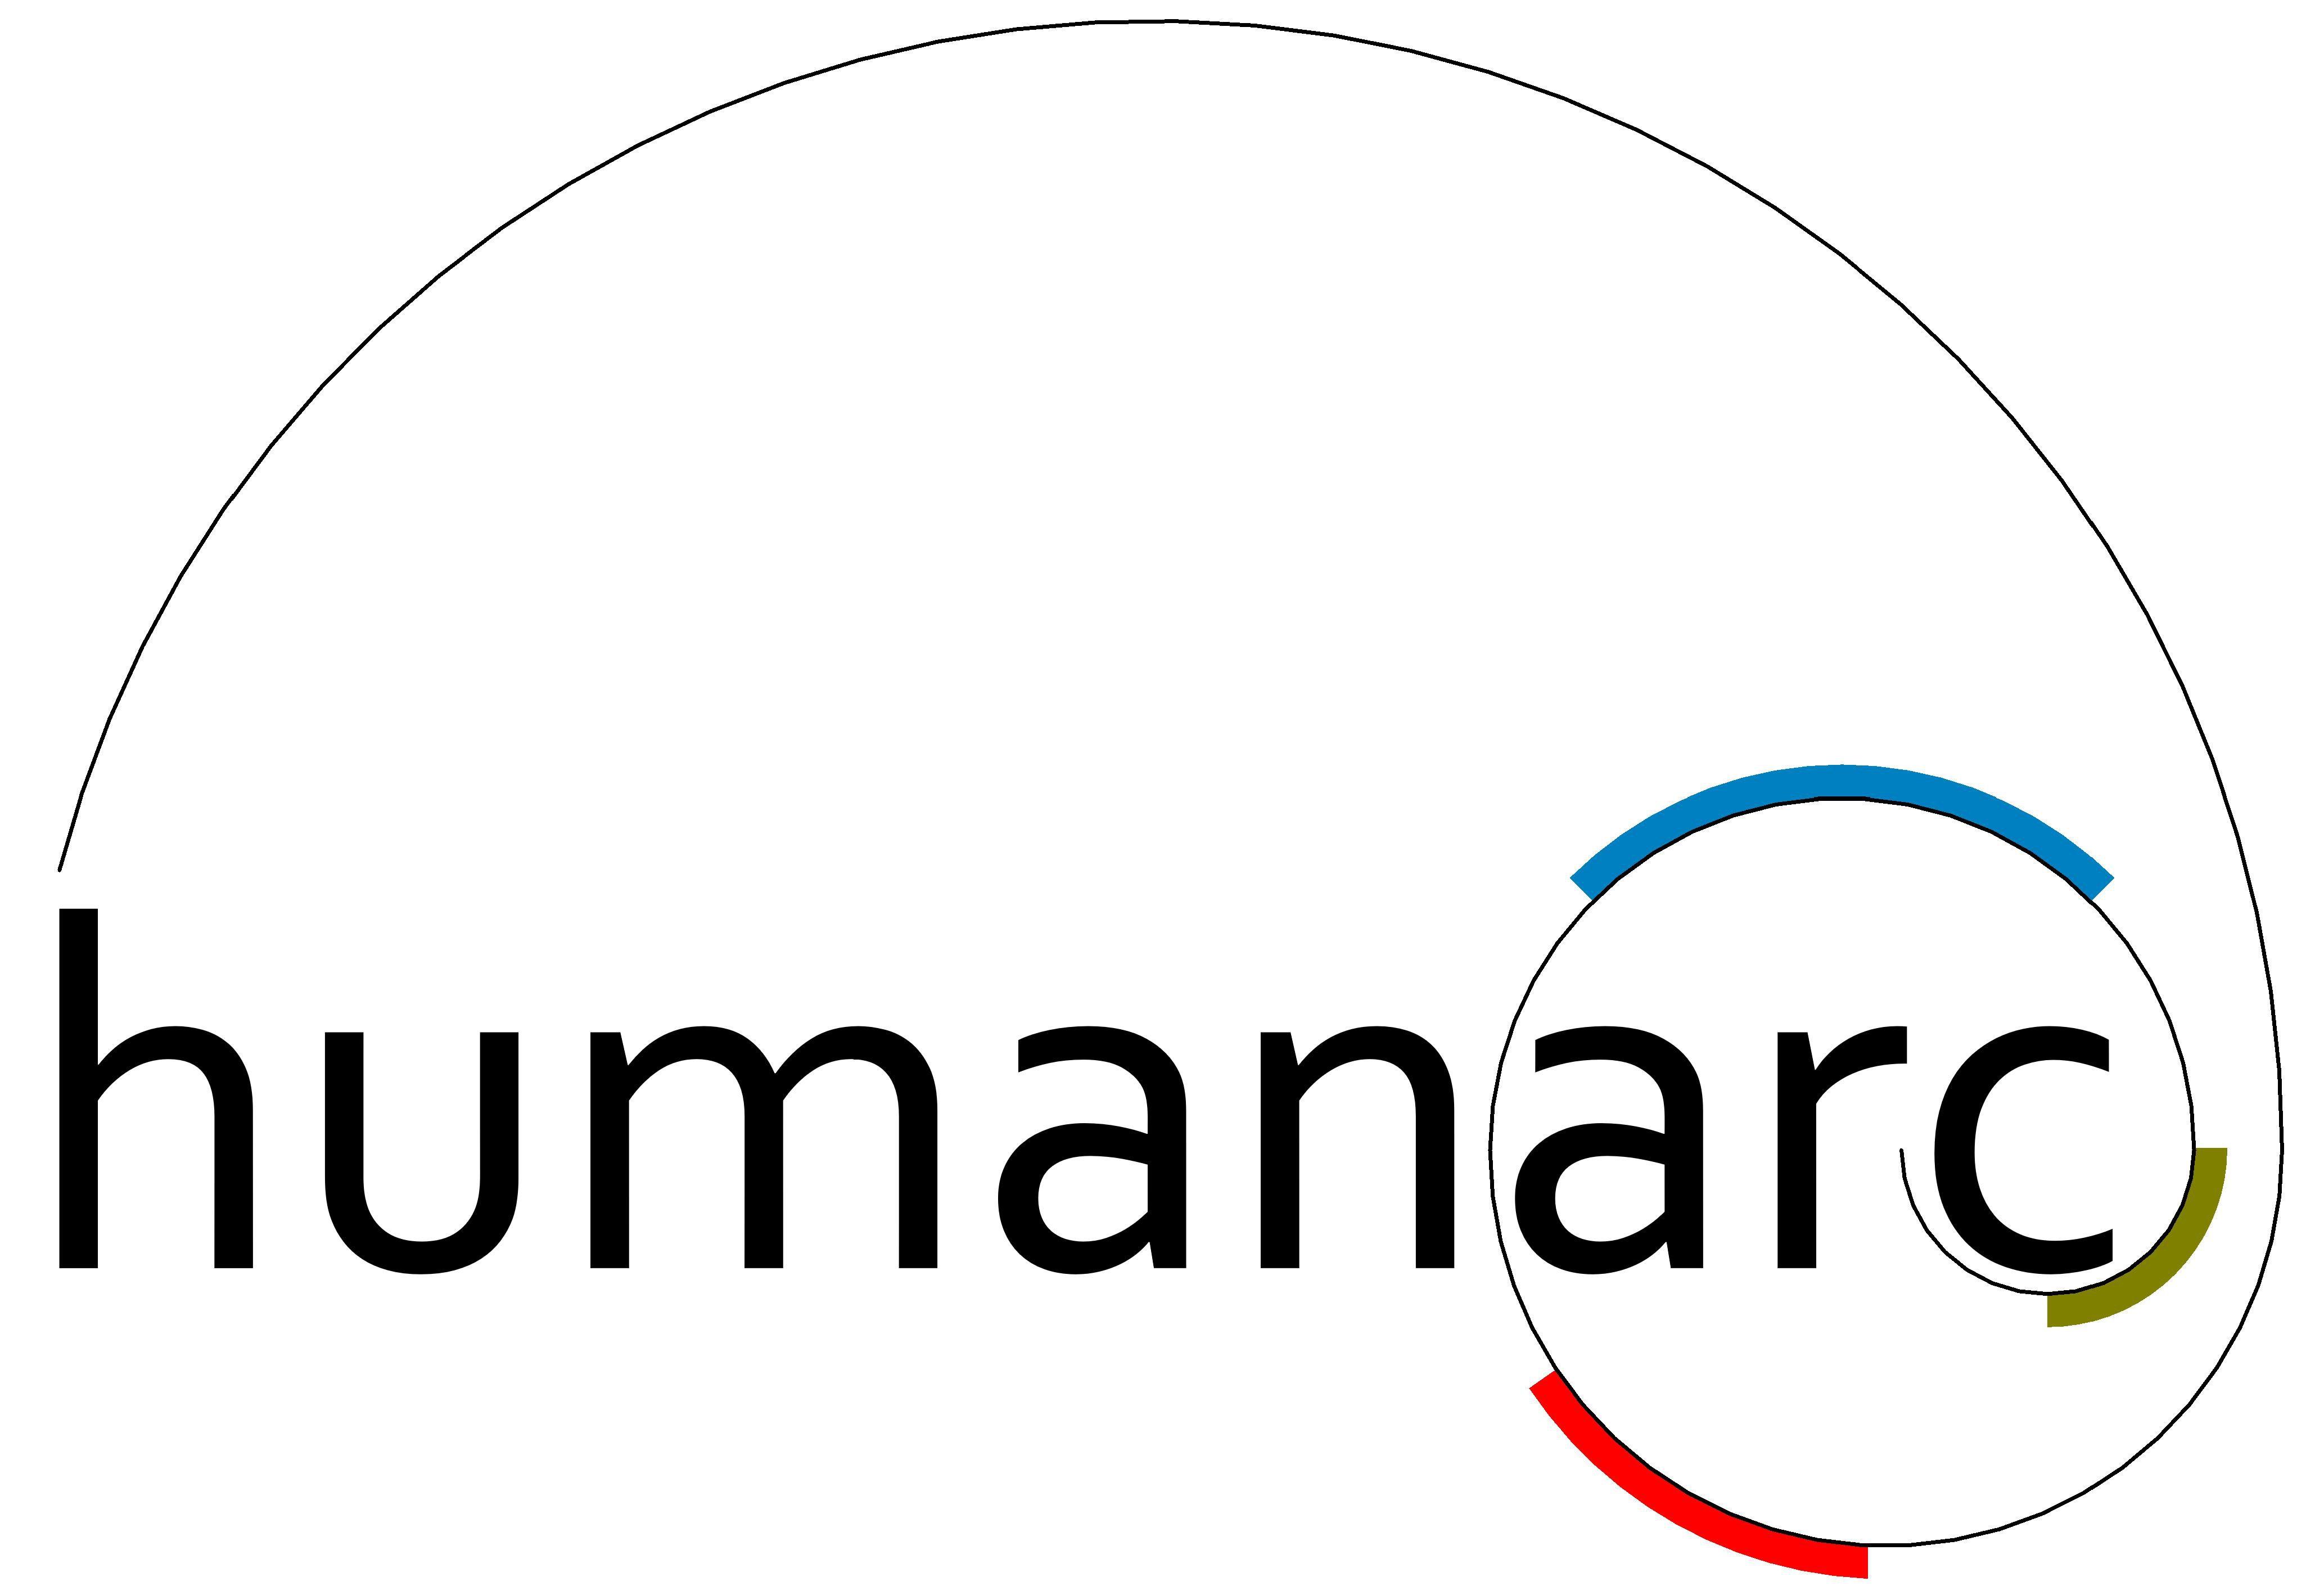 Humanarc logo